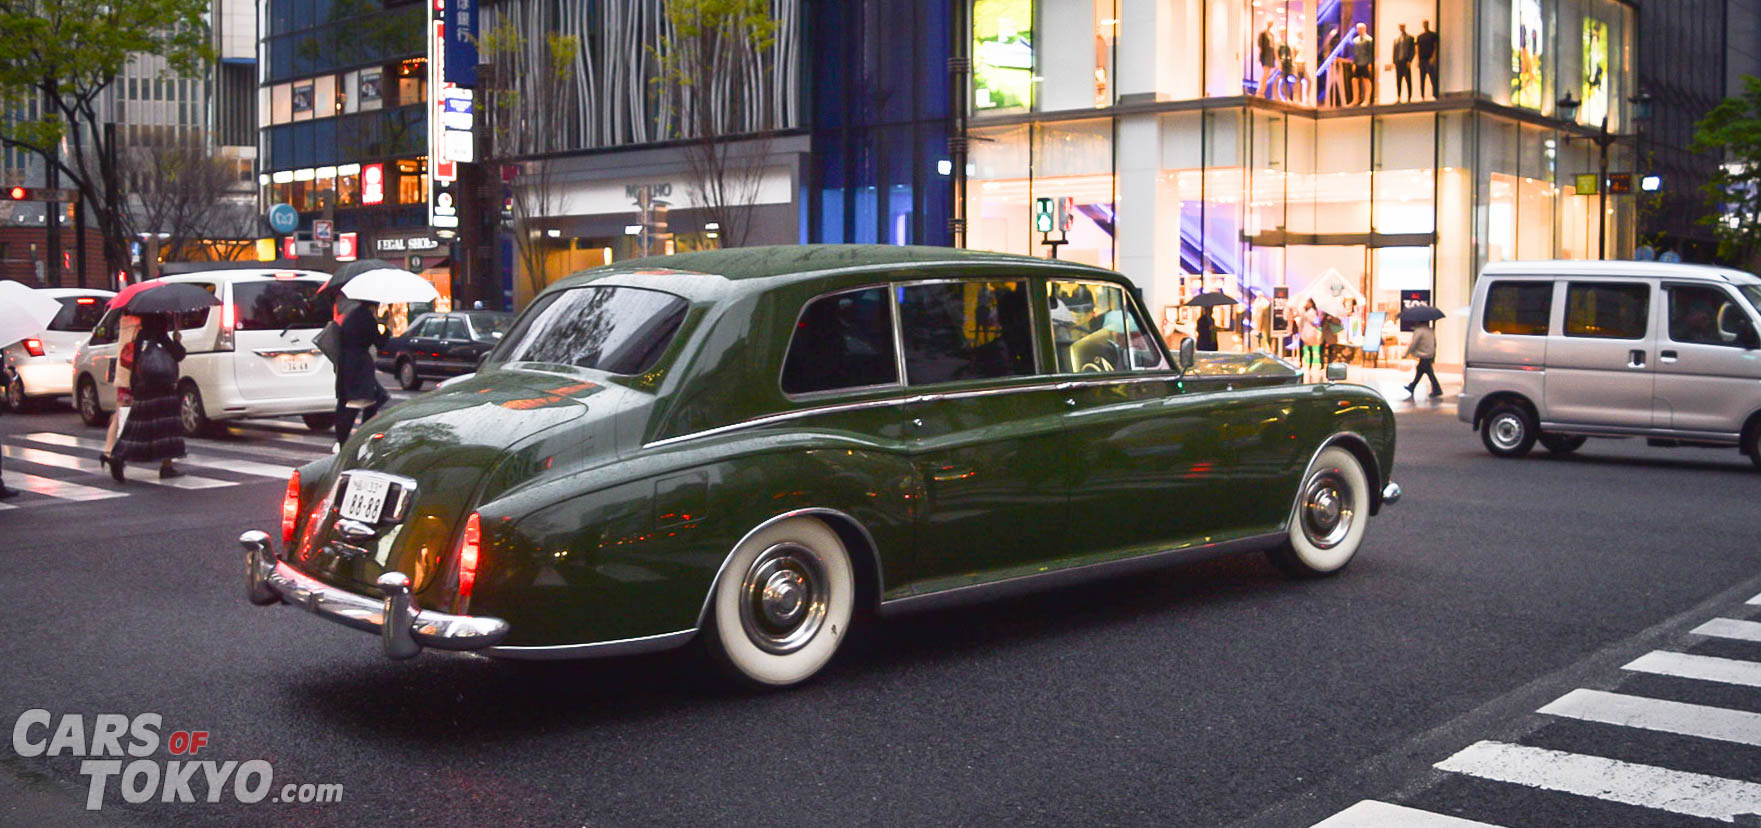 cars-of-tokyo-luxury-rolls-royce-classic